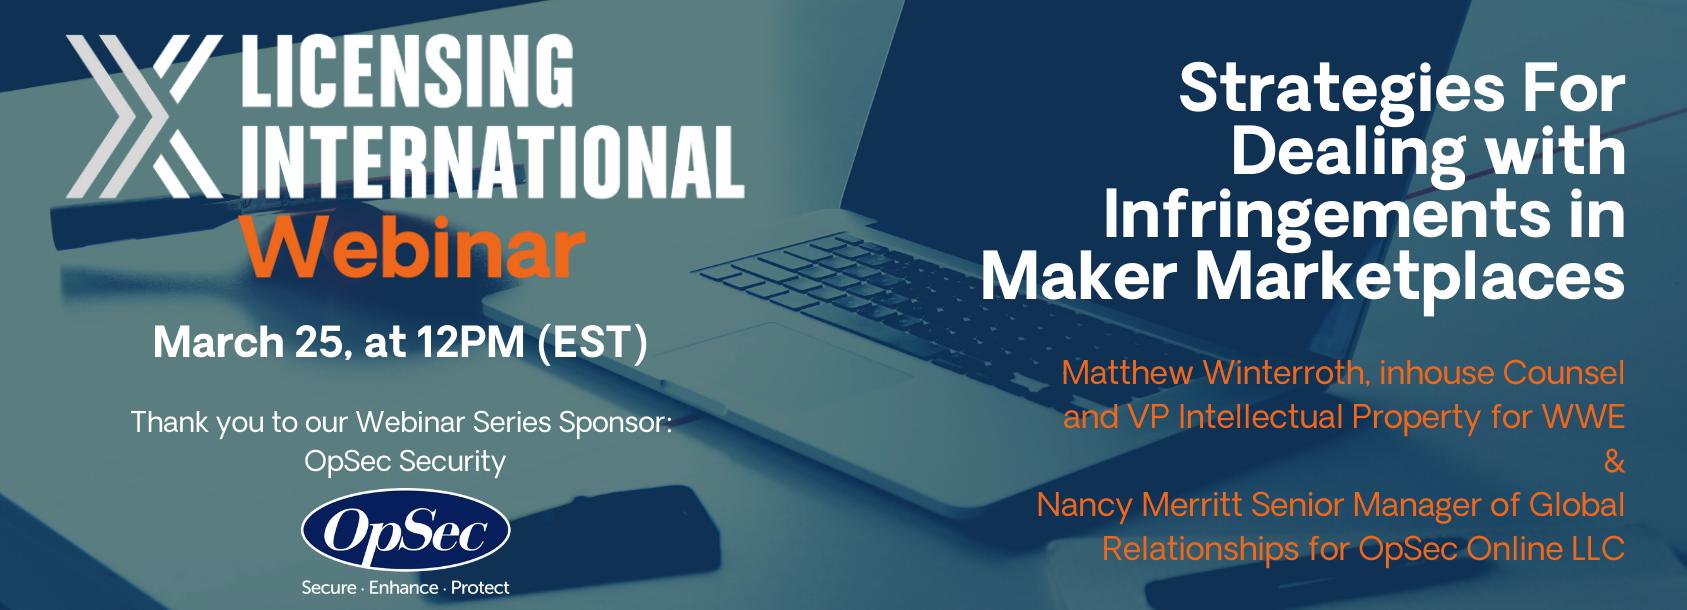 https://licensinginternational.org/events/webinar-strategies-for-dealing-with-infringements-in-maker-marketplaces/